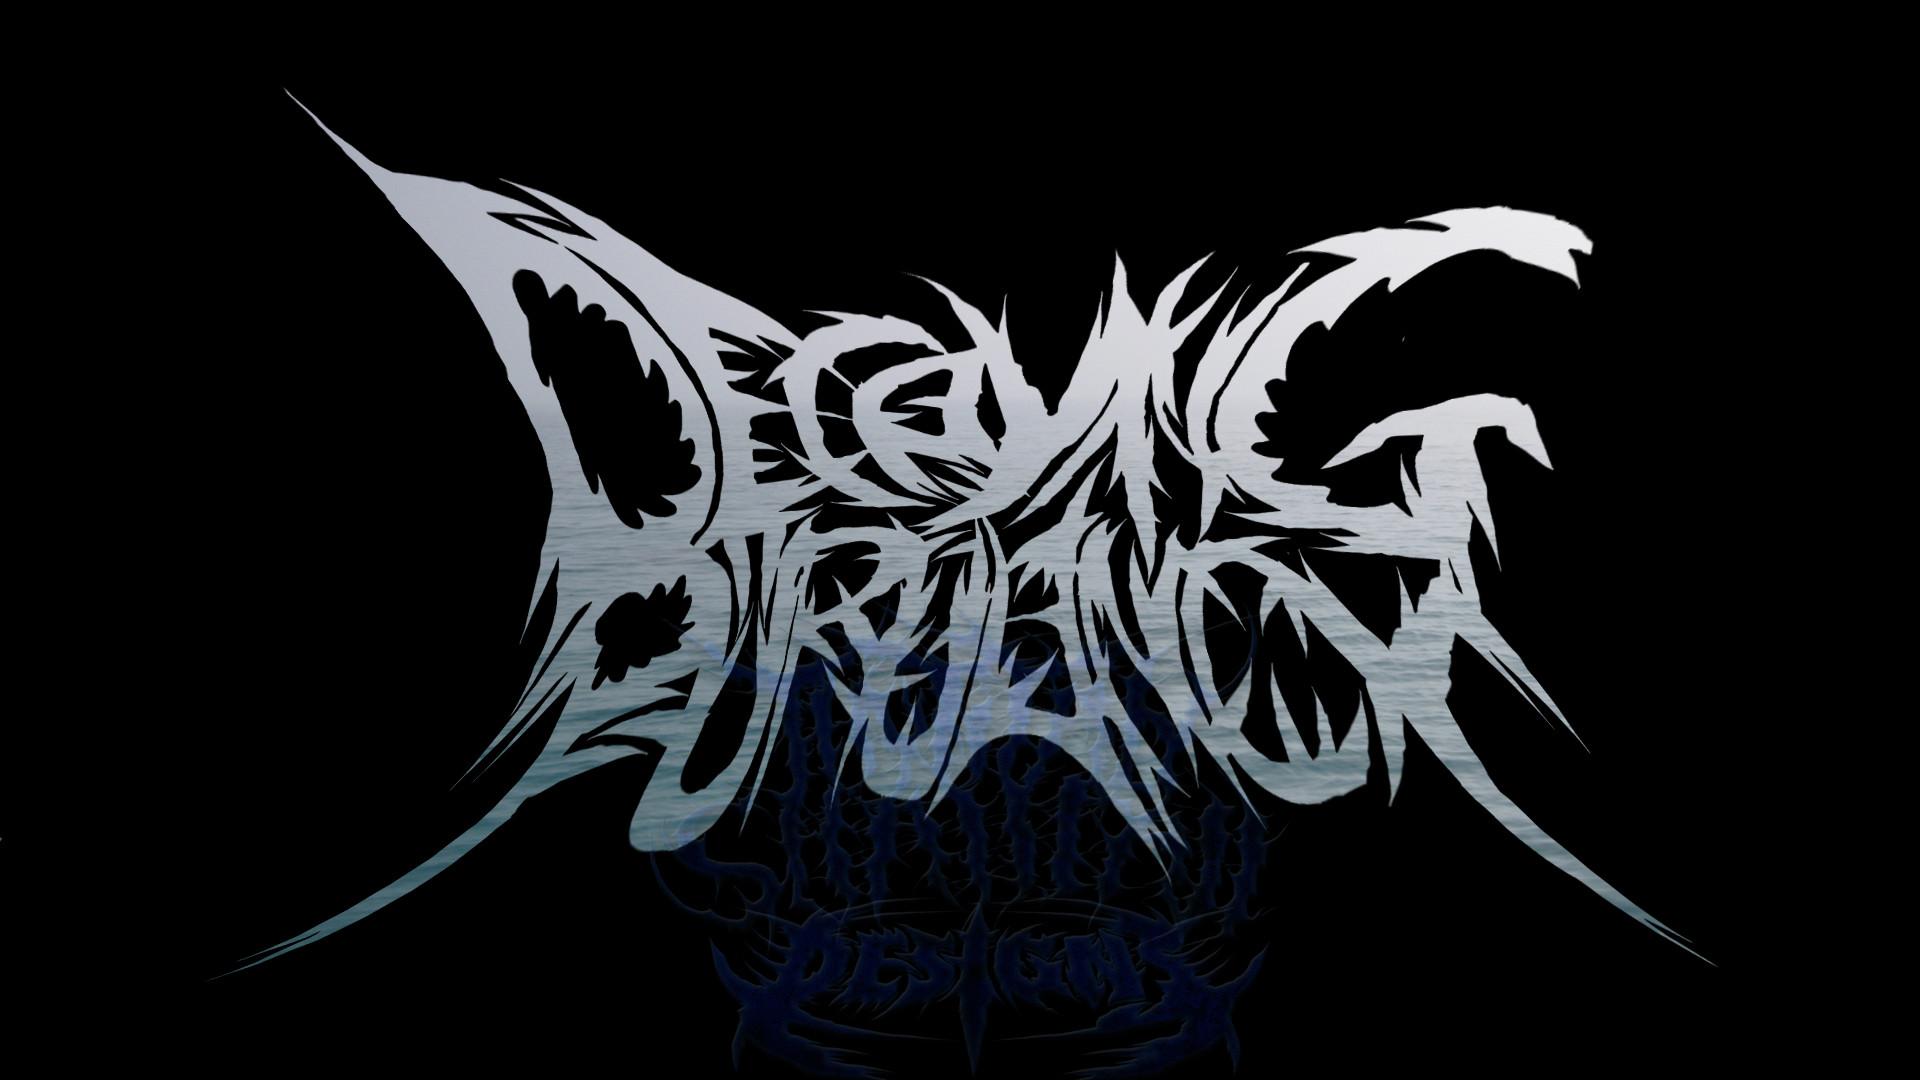 Death Metal Wallpaper (55+ images)